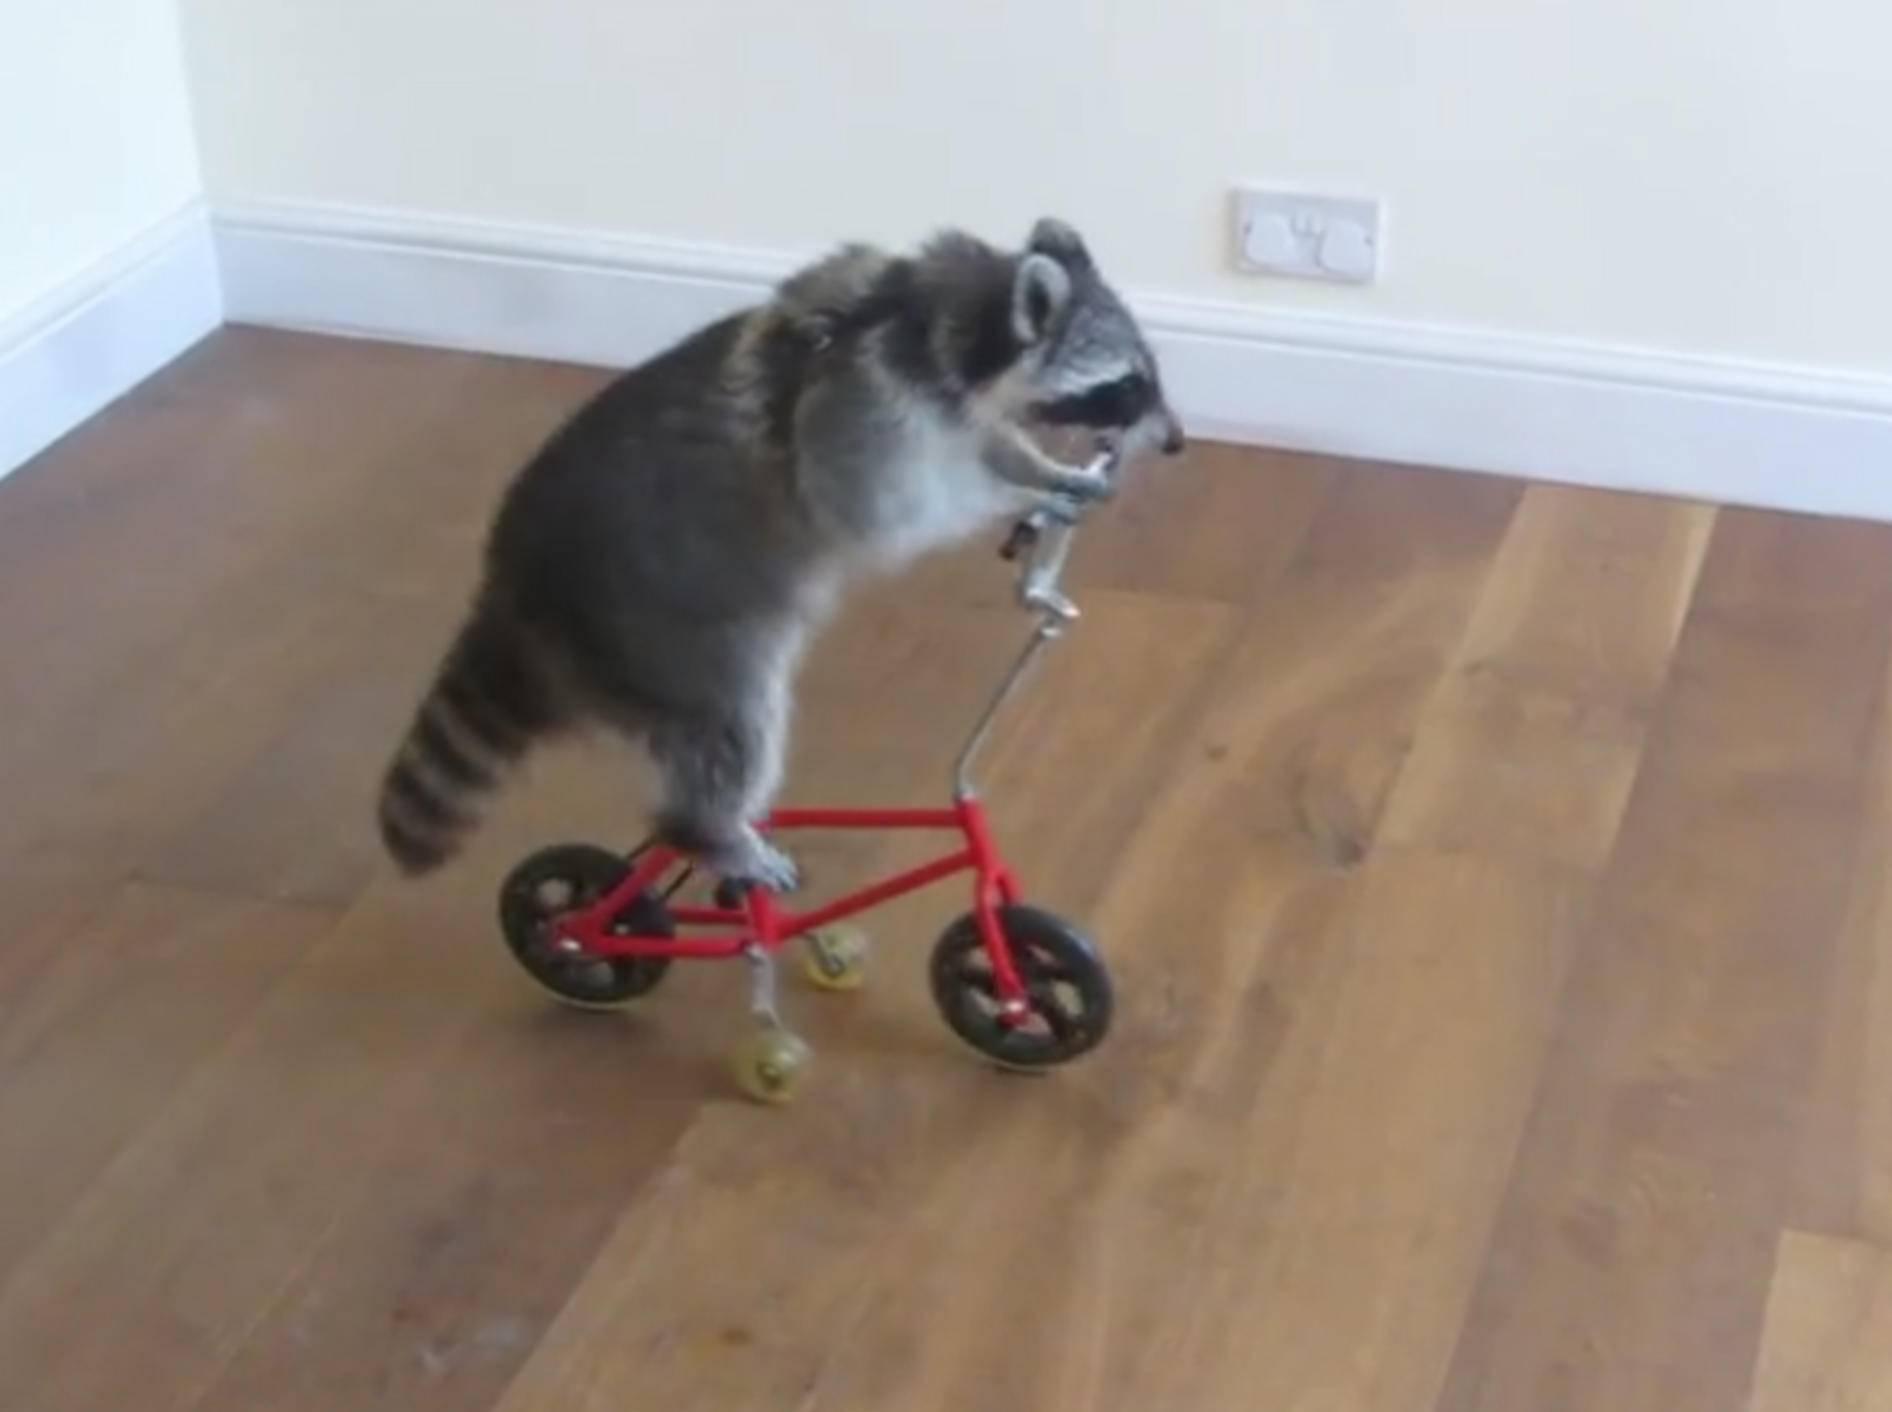 Hui, dieser Waschbär fährt gern Fahrrad – YouTube / Melanie Raccoon